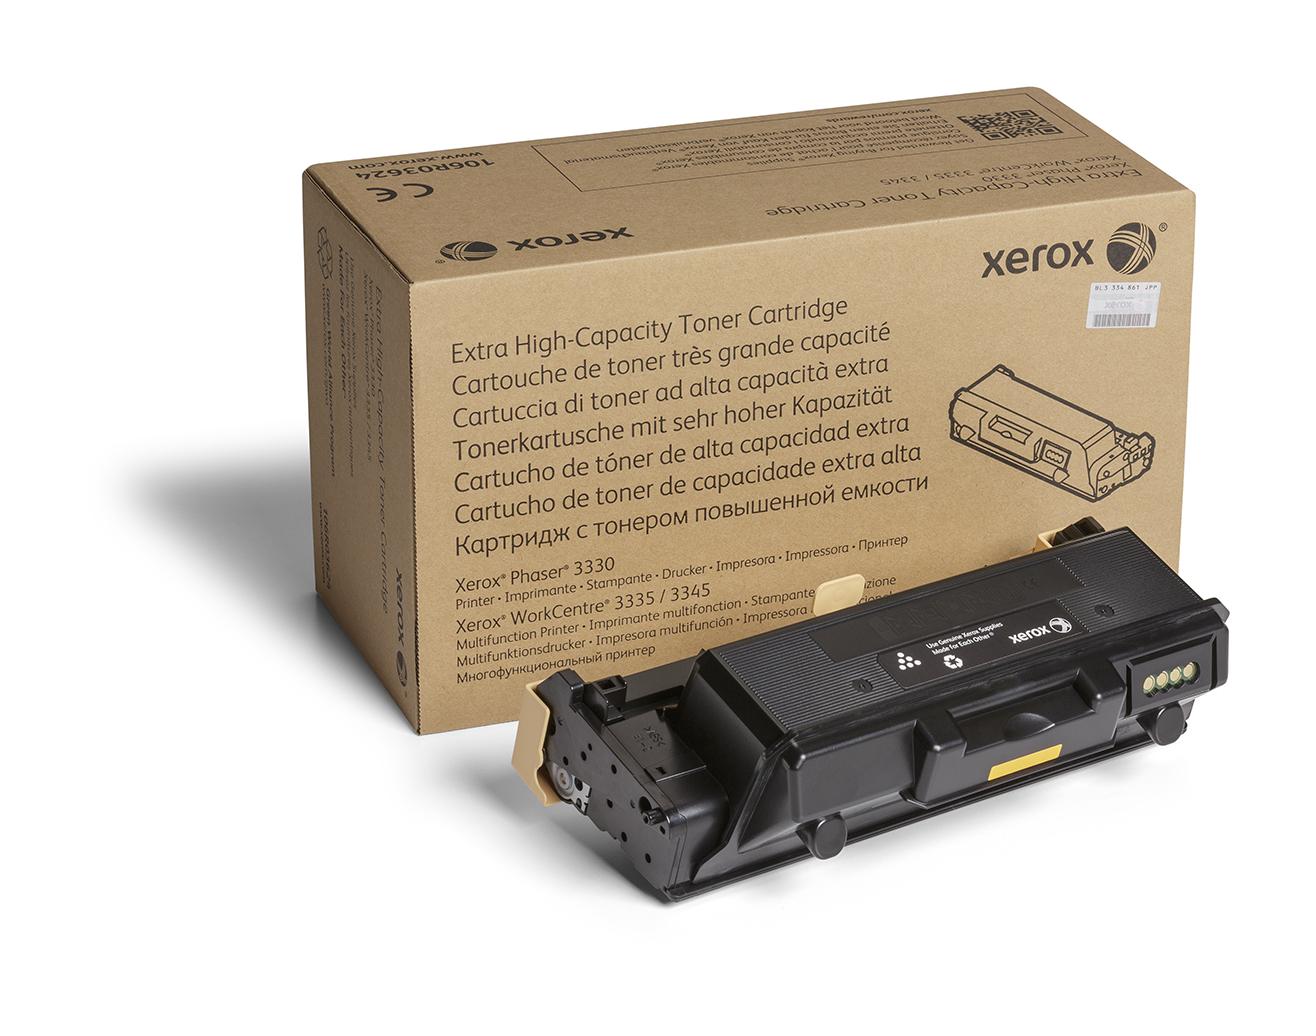 106R03624 | Original Xerox Toner Cartridge - Black